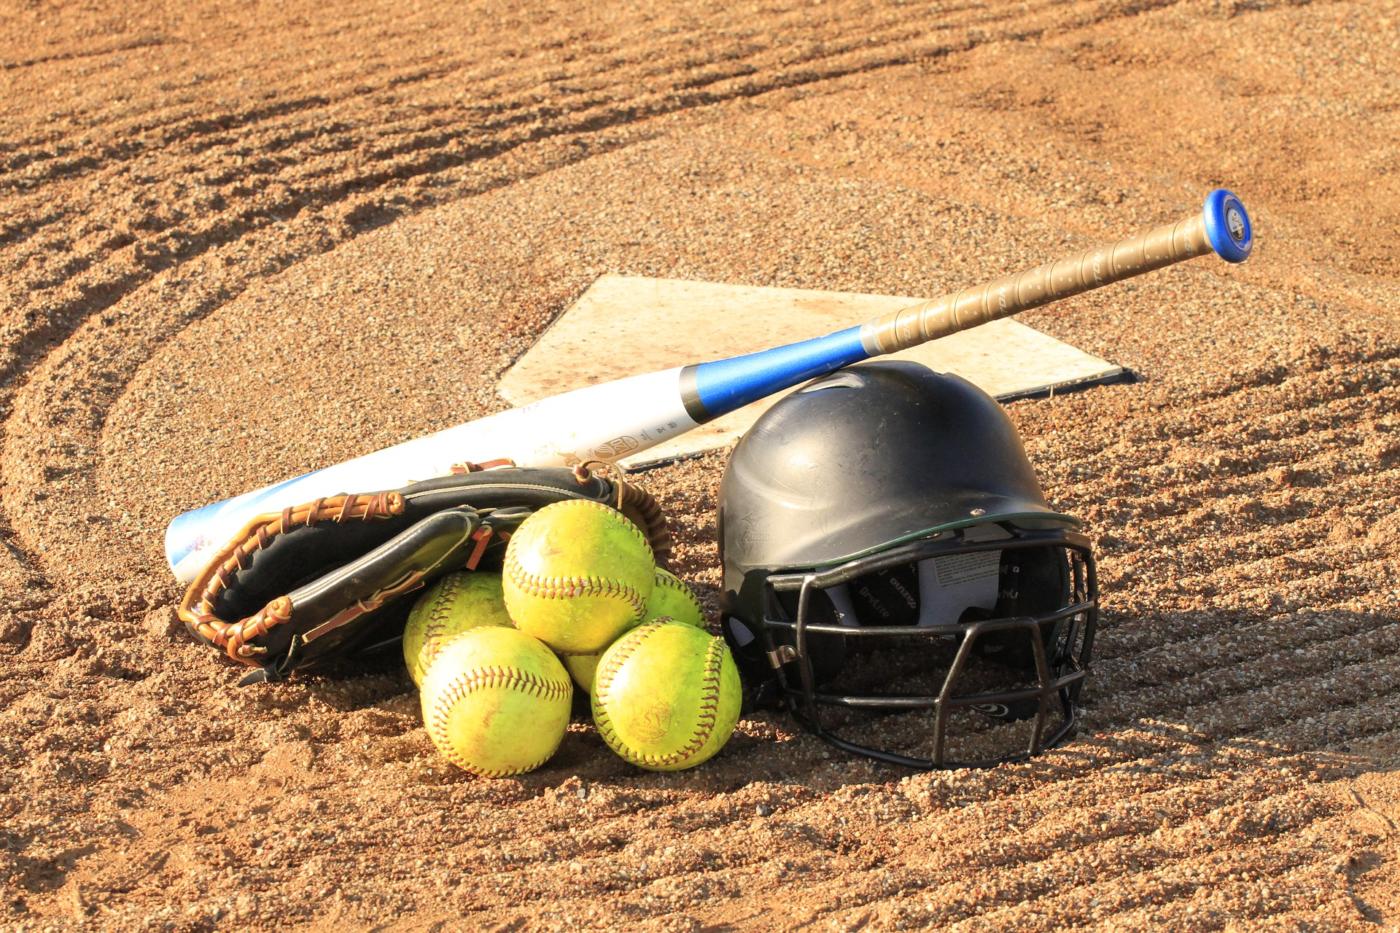 Softball equipment on field